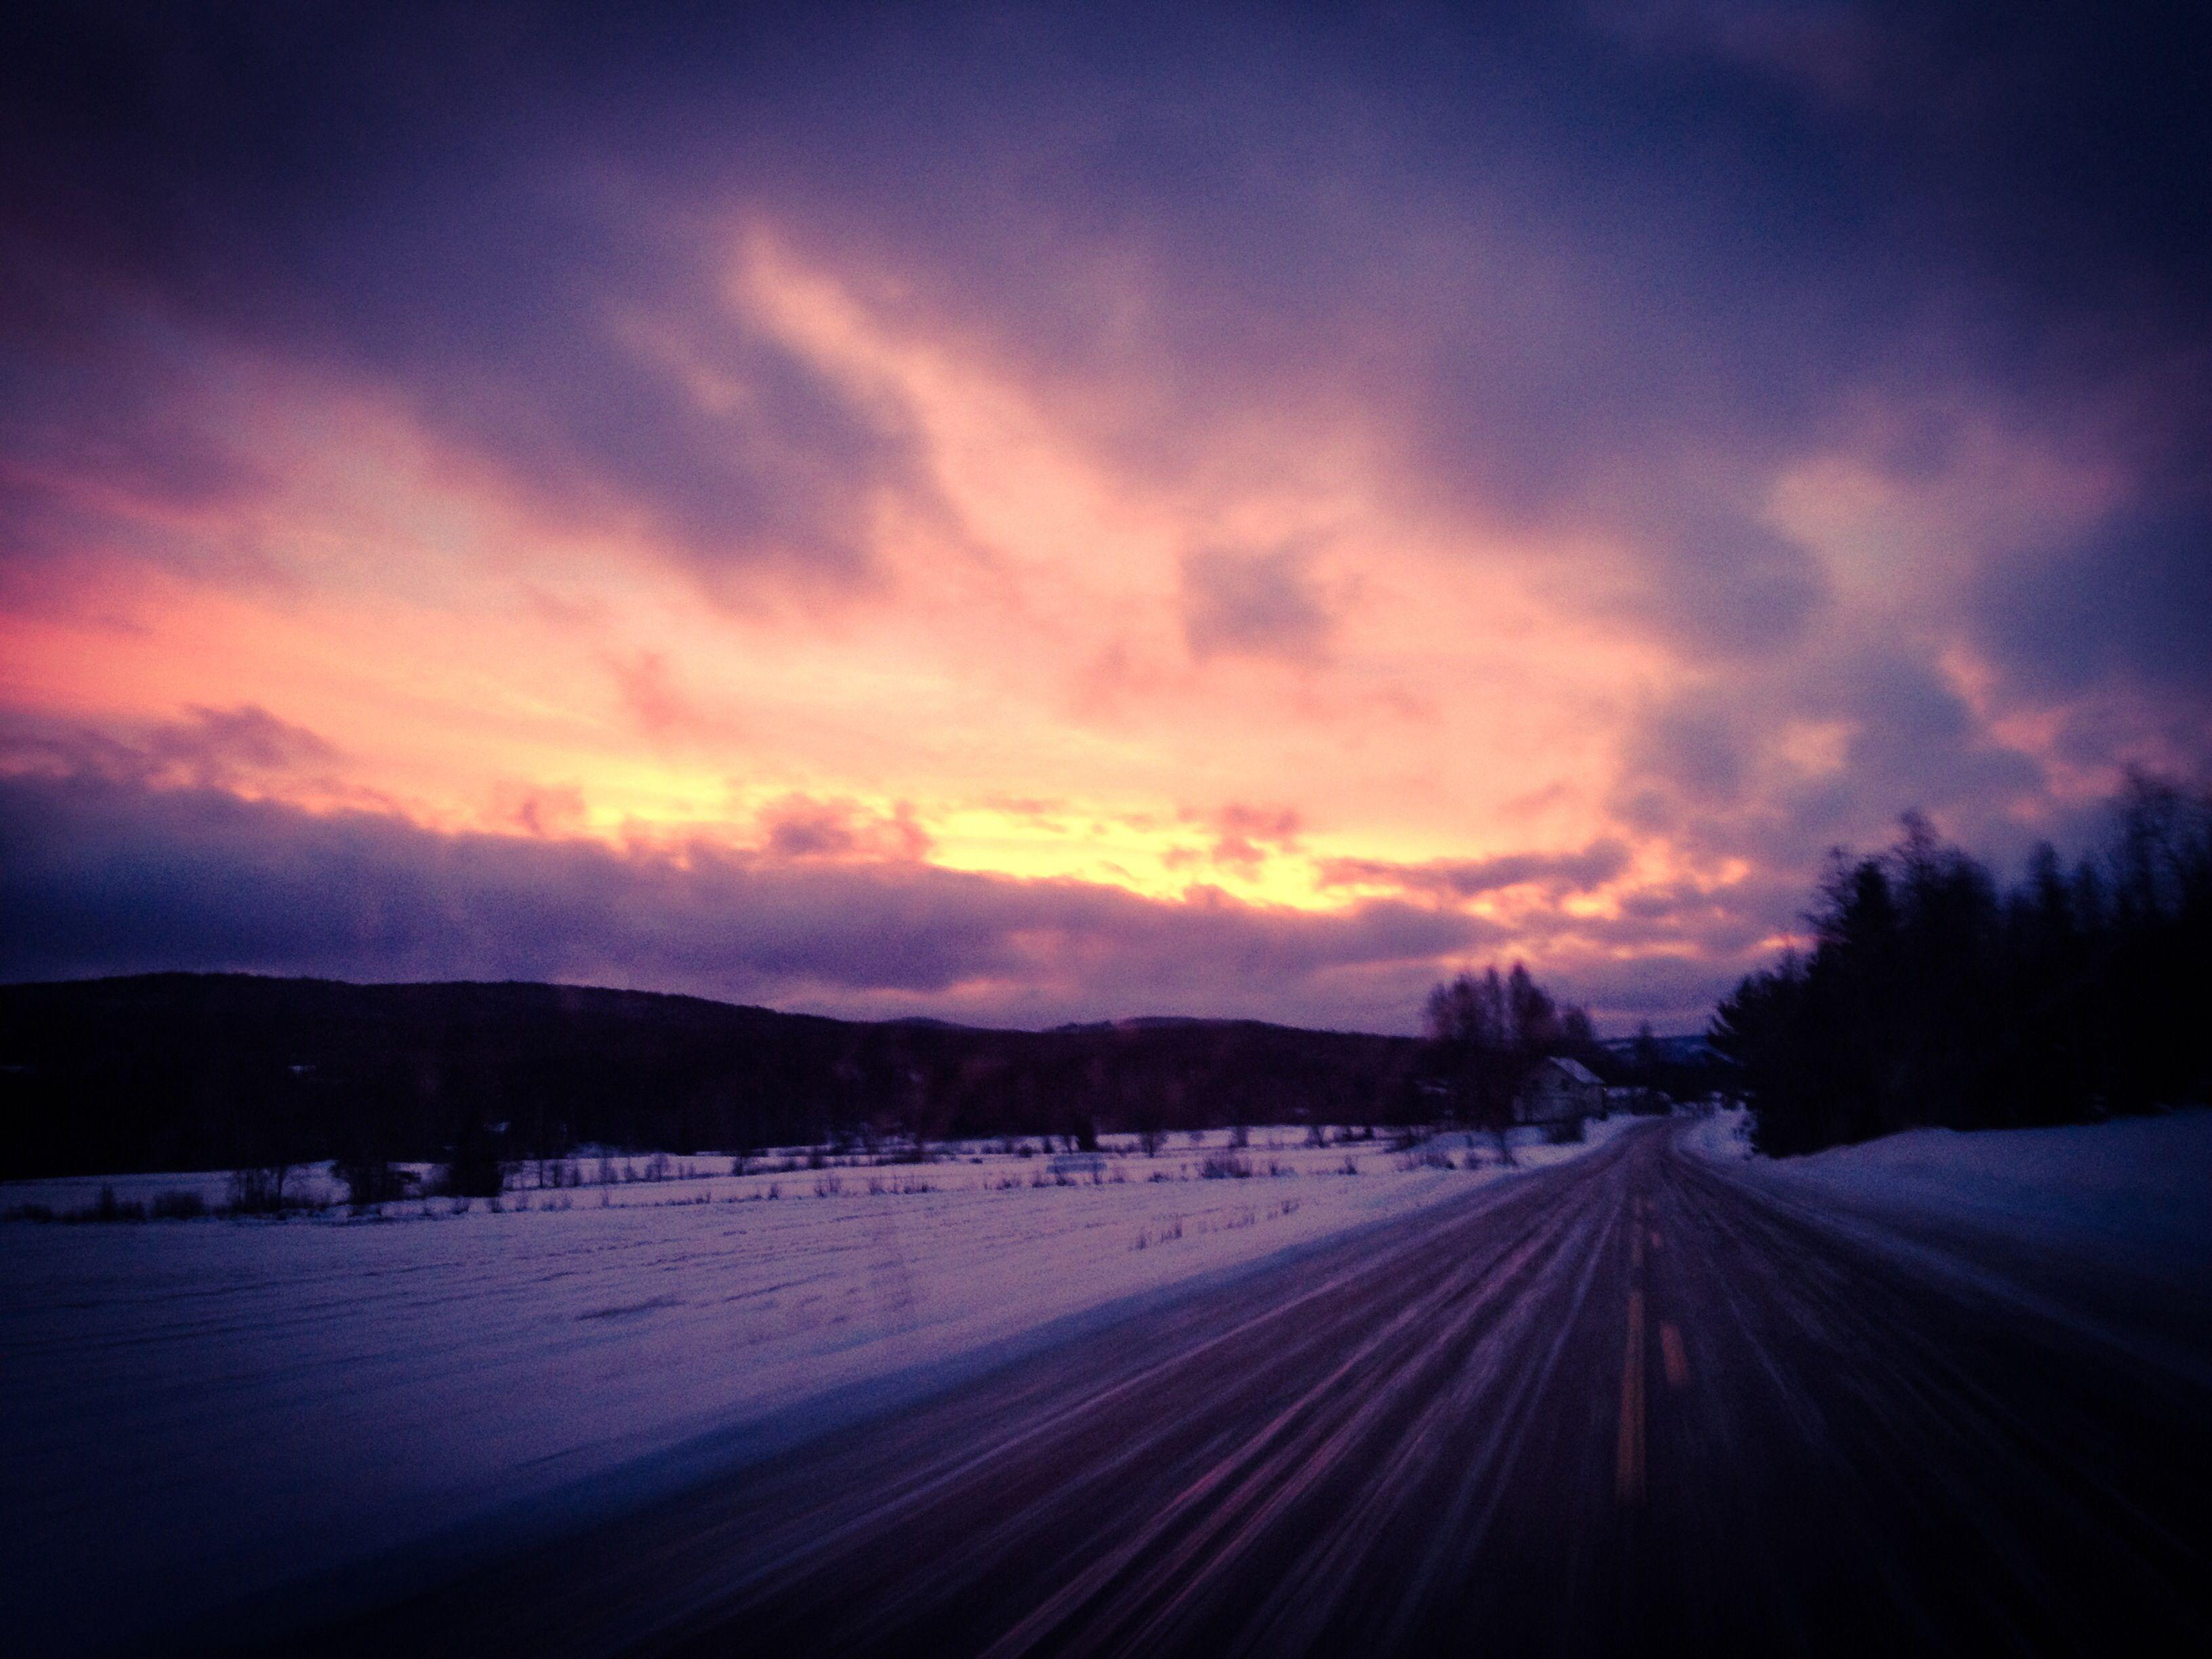 Roadtrip. Norway, Hedmark